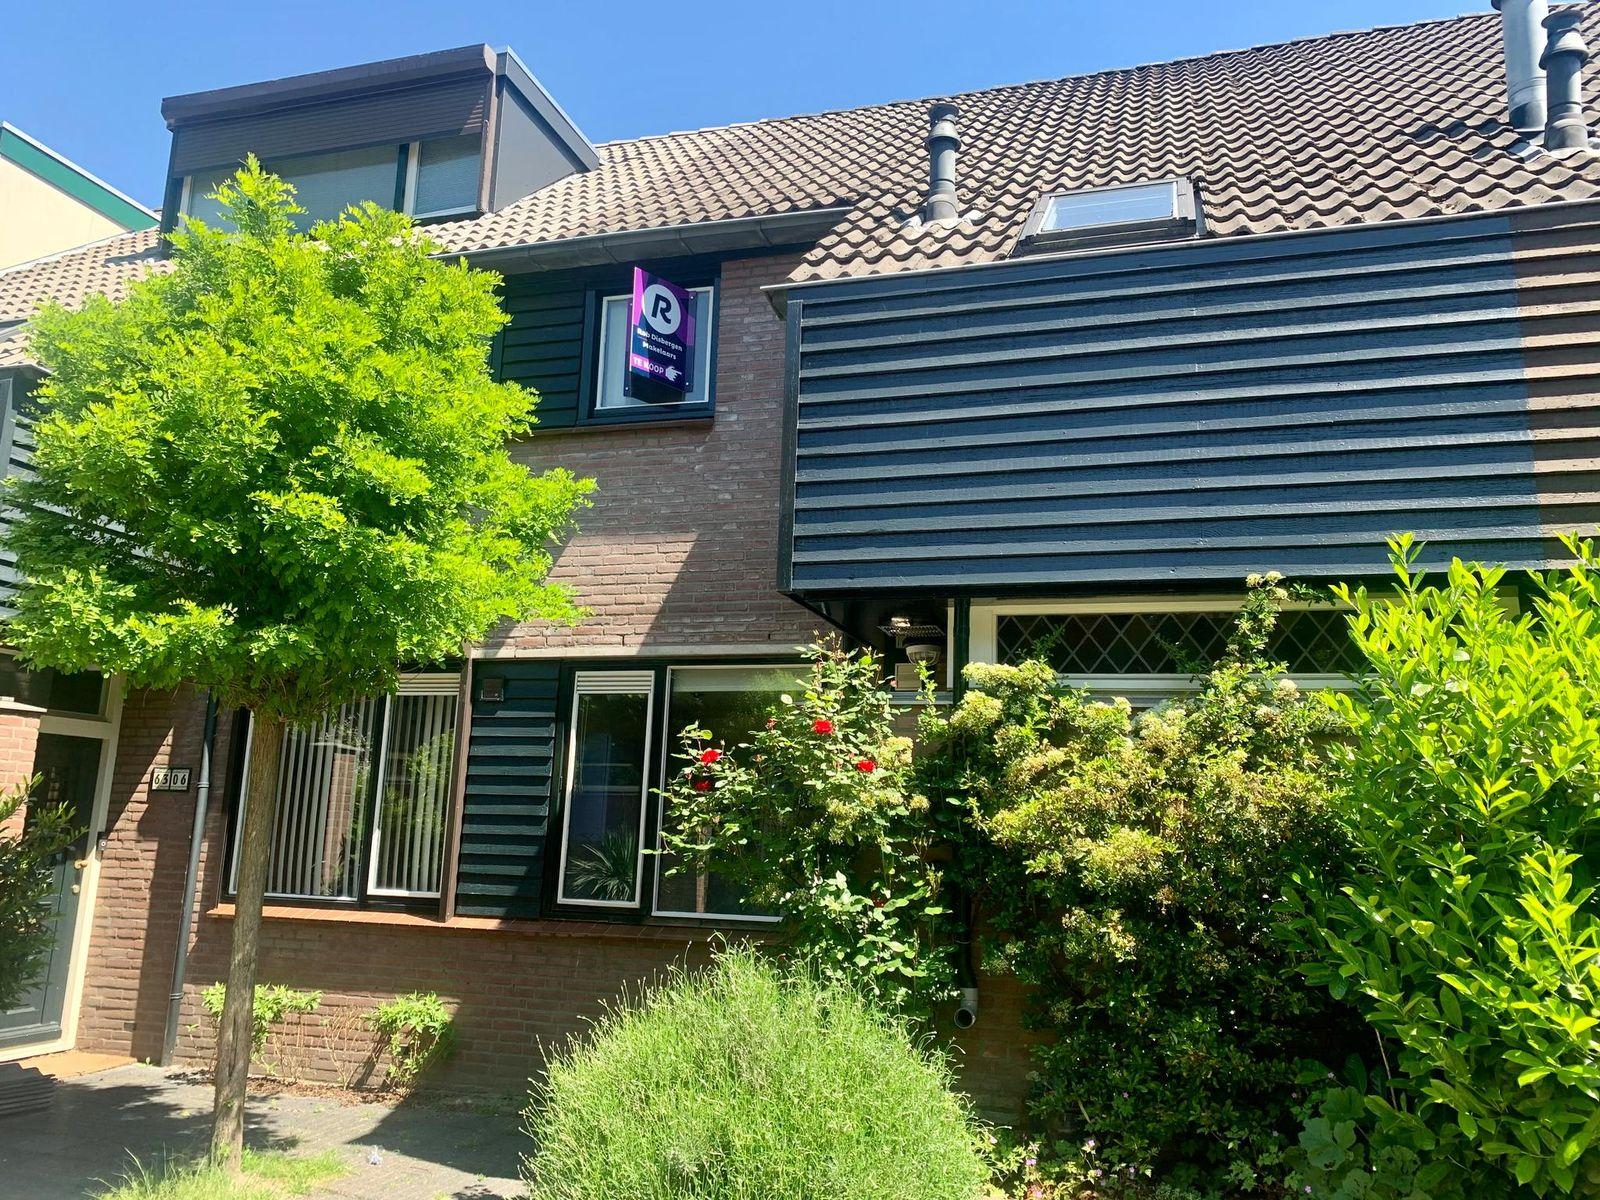 Zwanenveld 6304, Nijmegen